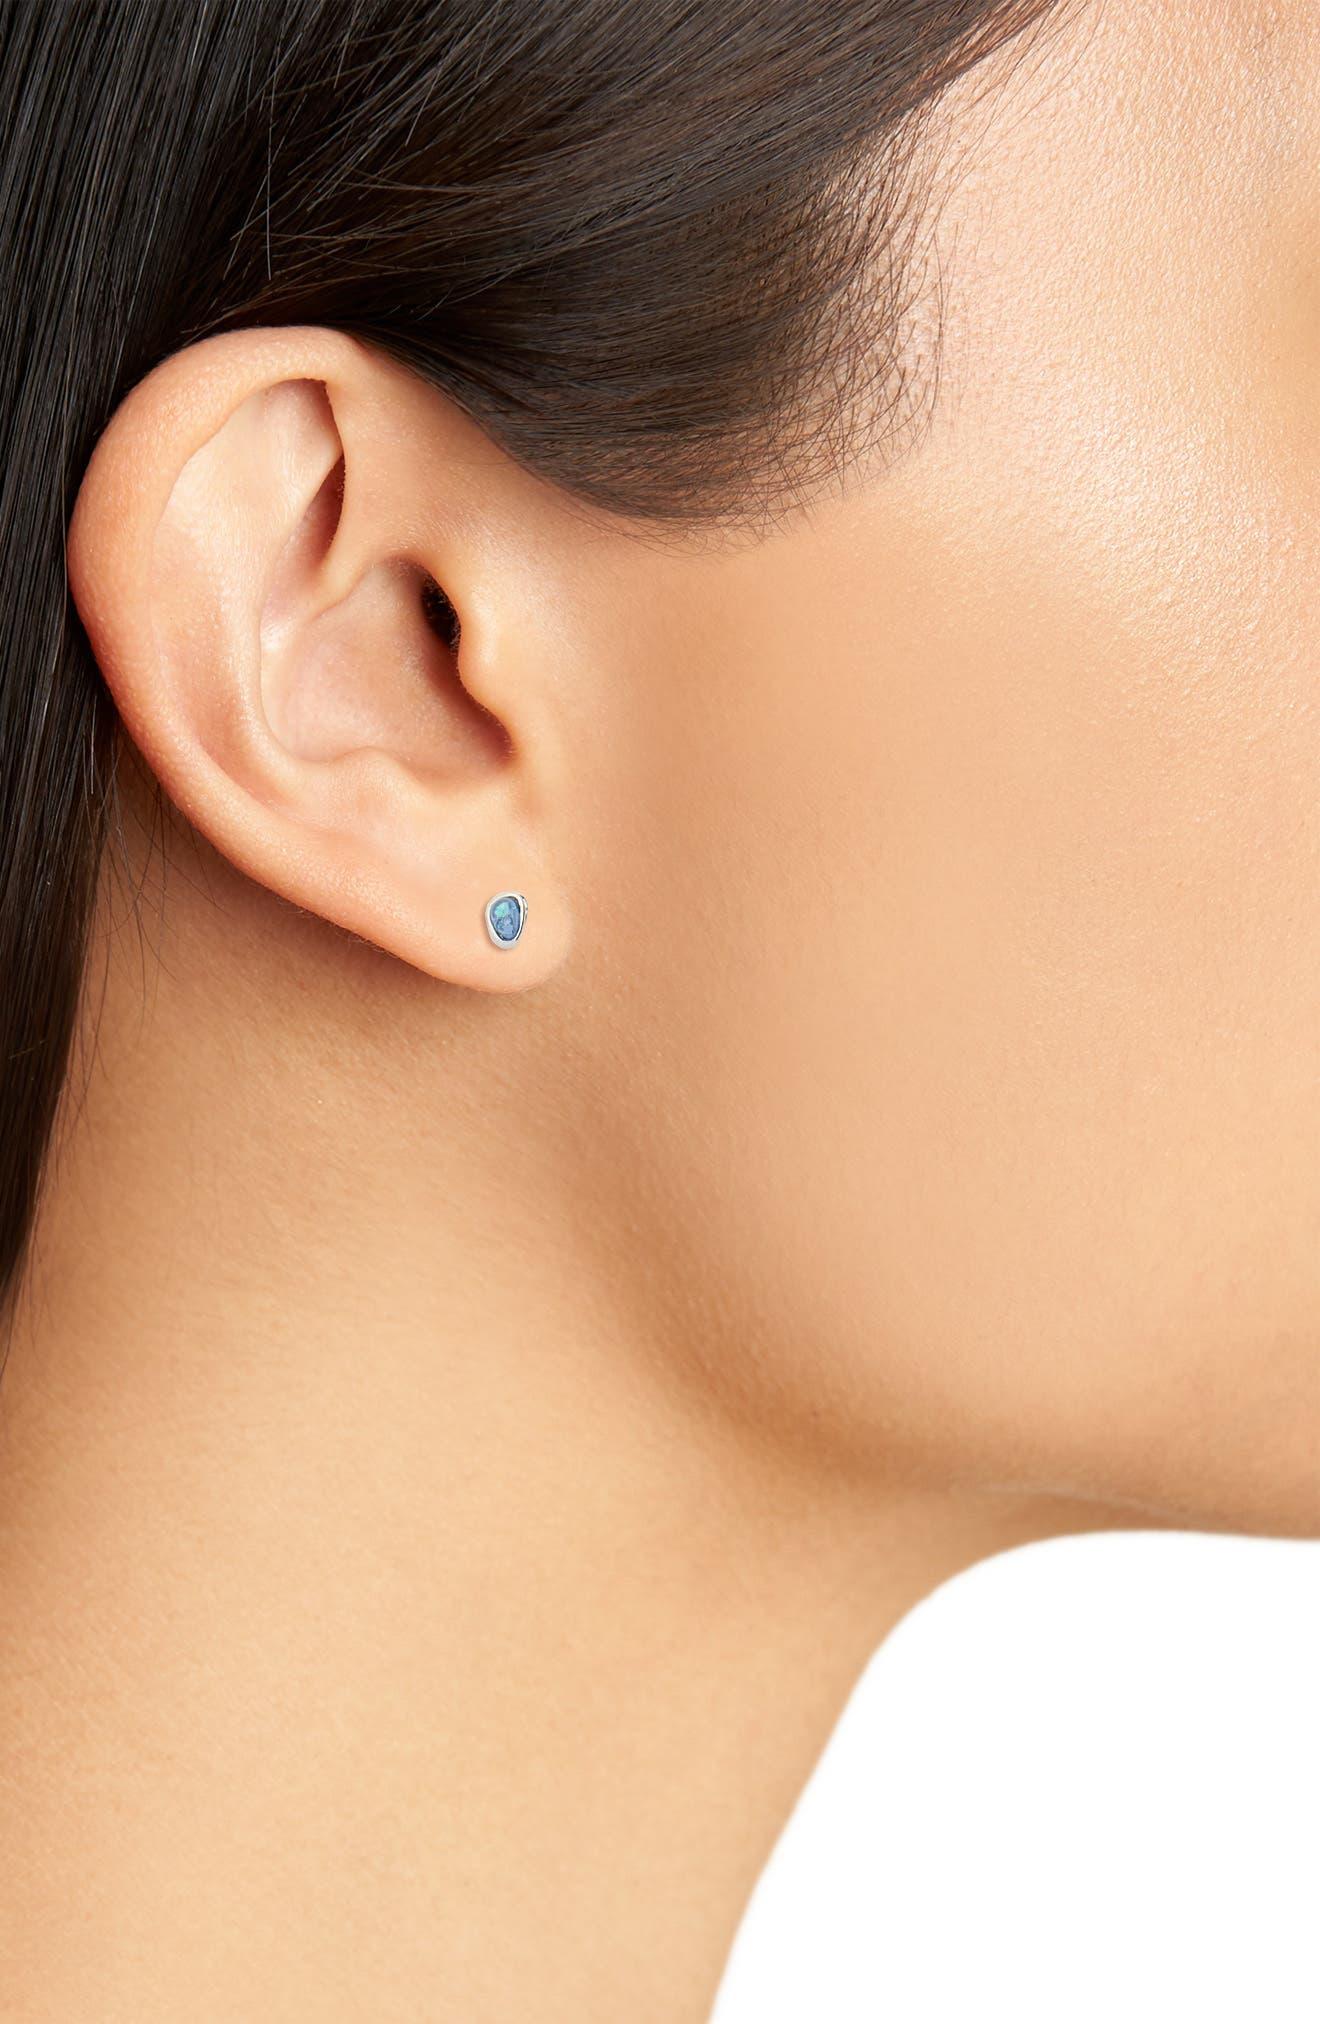 6-Pack Dainty Stone Stud Earrings,                             Alternate thumbnail 2, color,                             Silver/ Blue